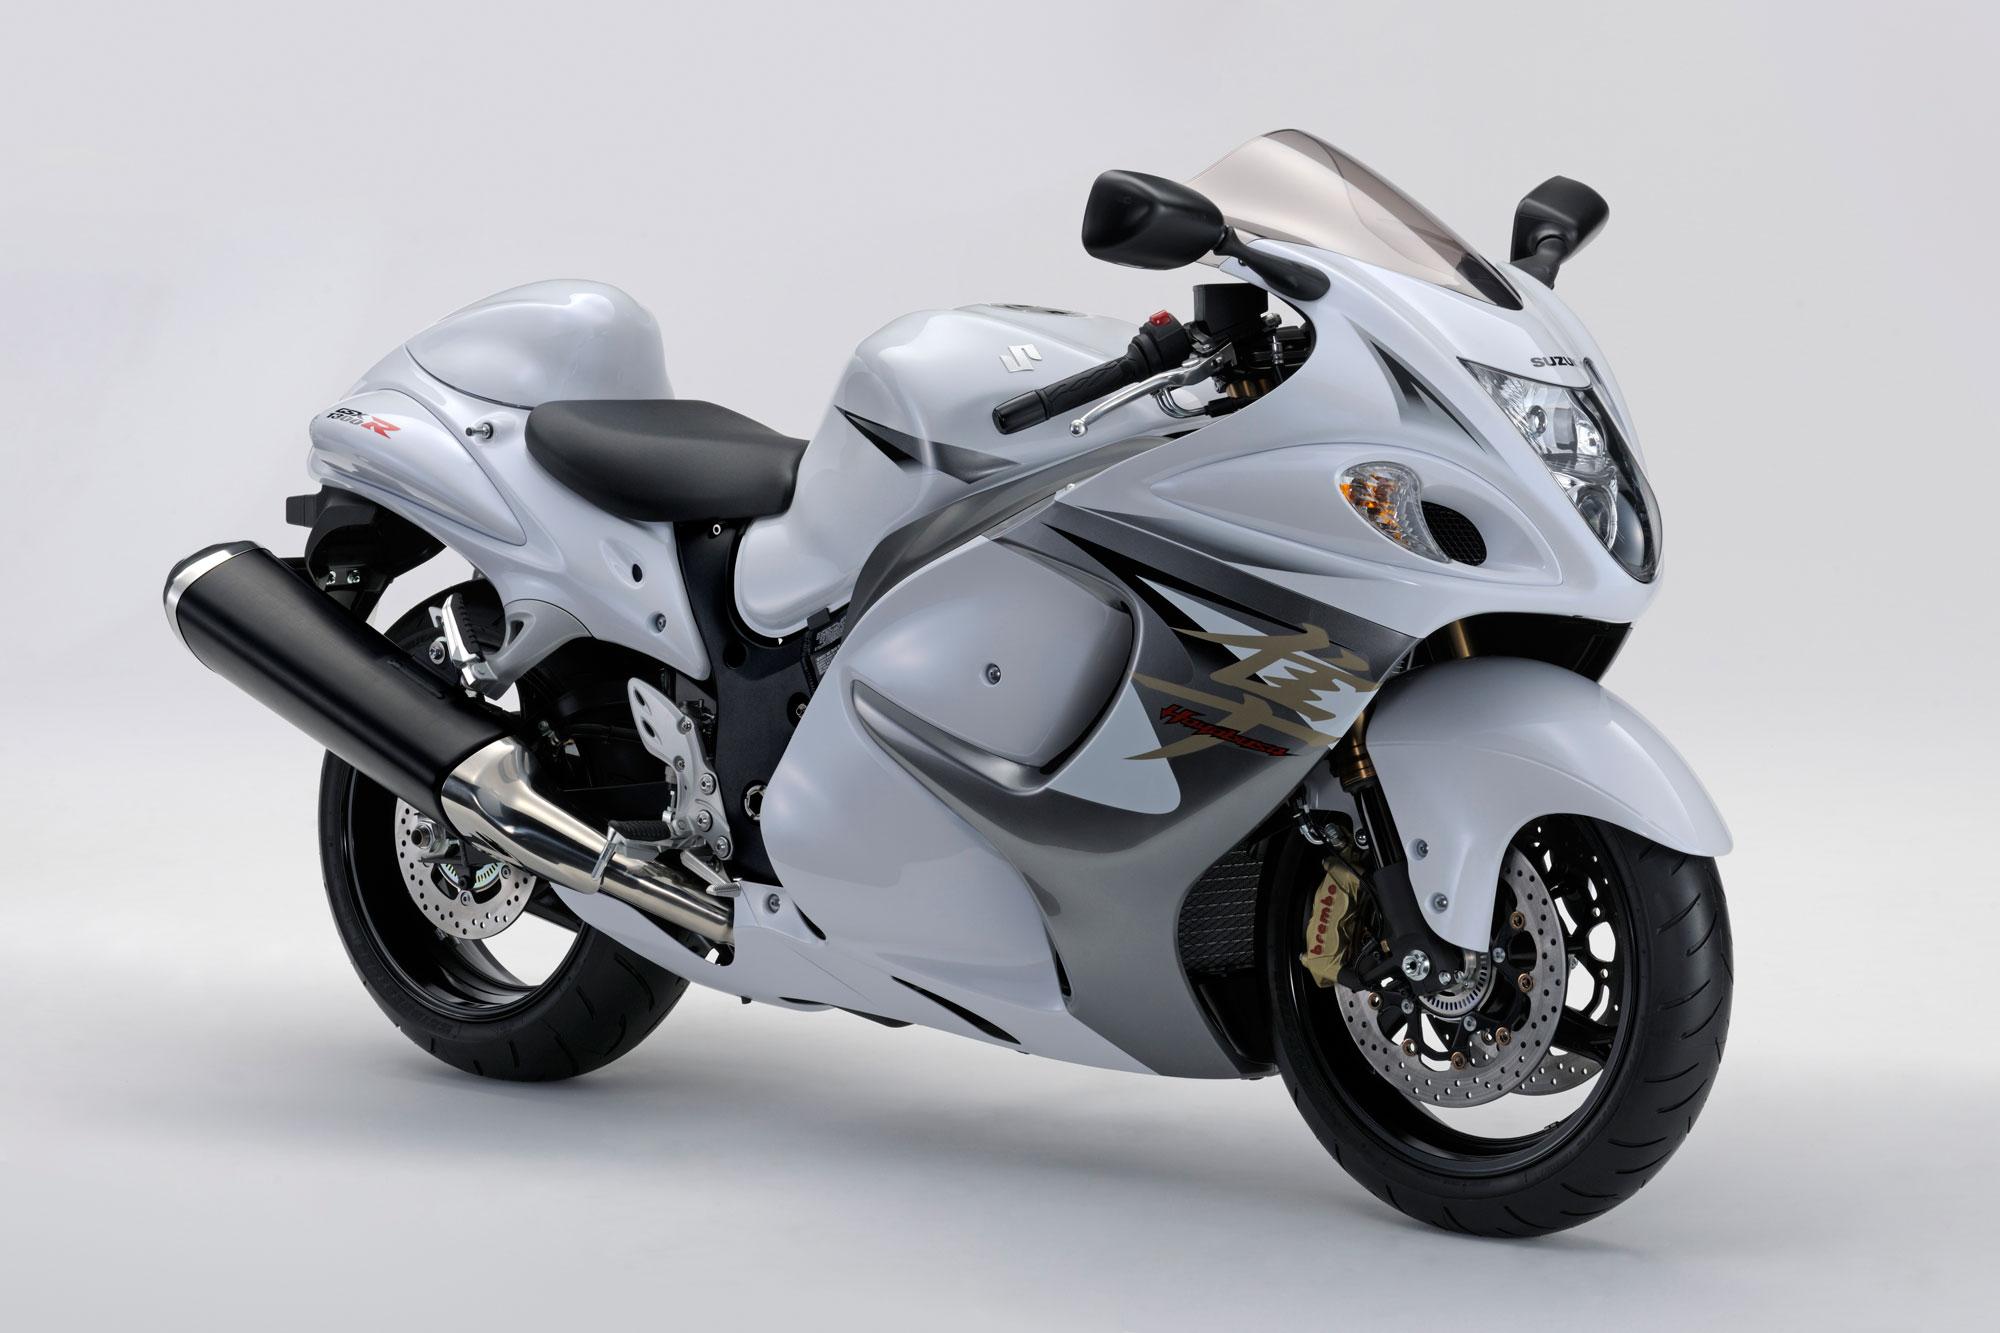 2019 Suzuki Hayabusa Will Have Fully Active Suspension Bikesrepublic